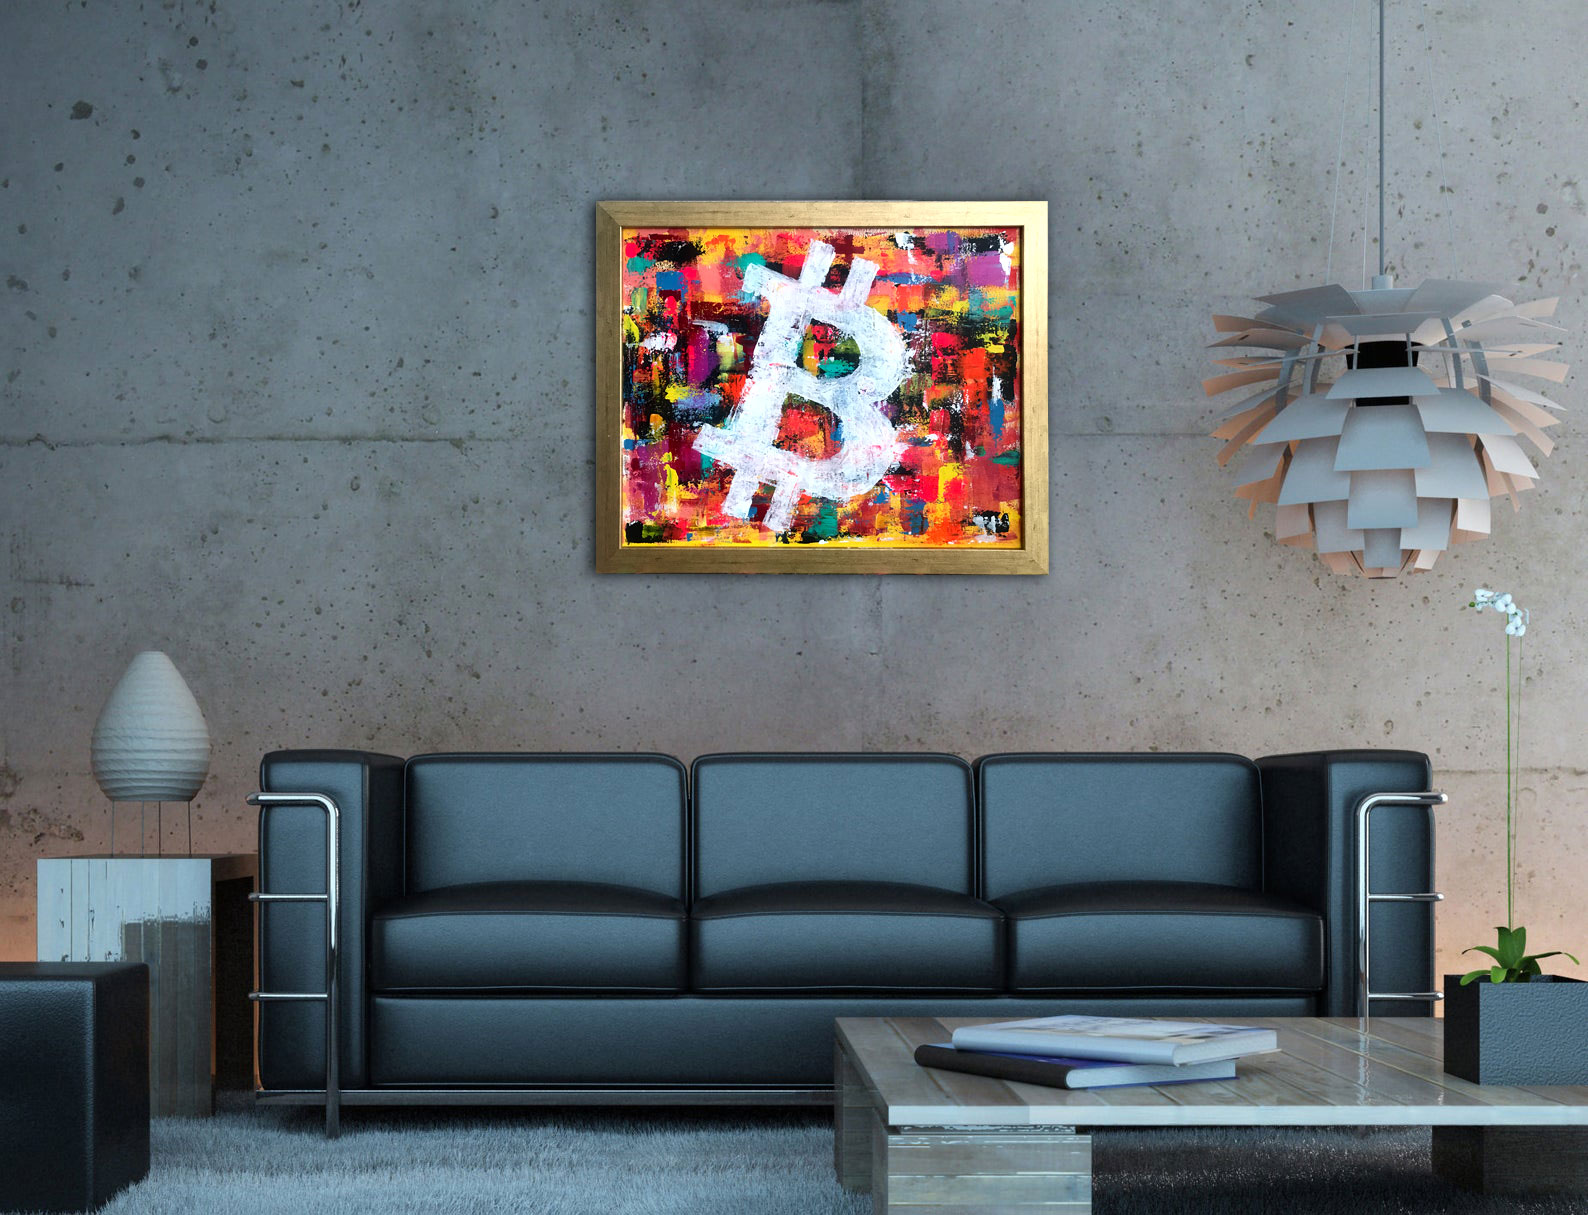 Bitcoin Art Acrylic Painting by Sergey Gordienko